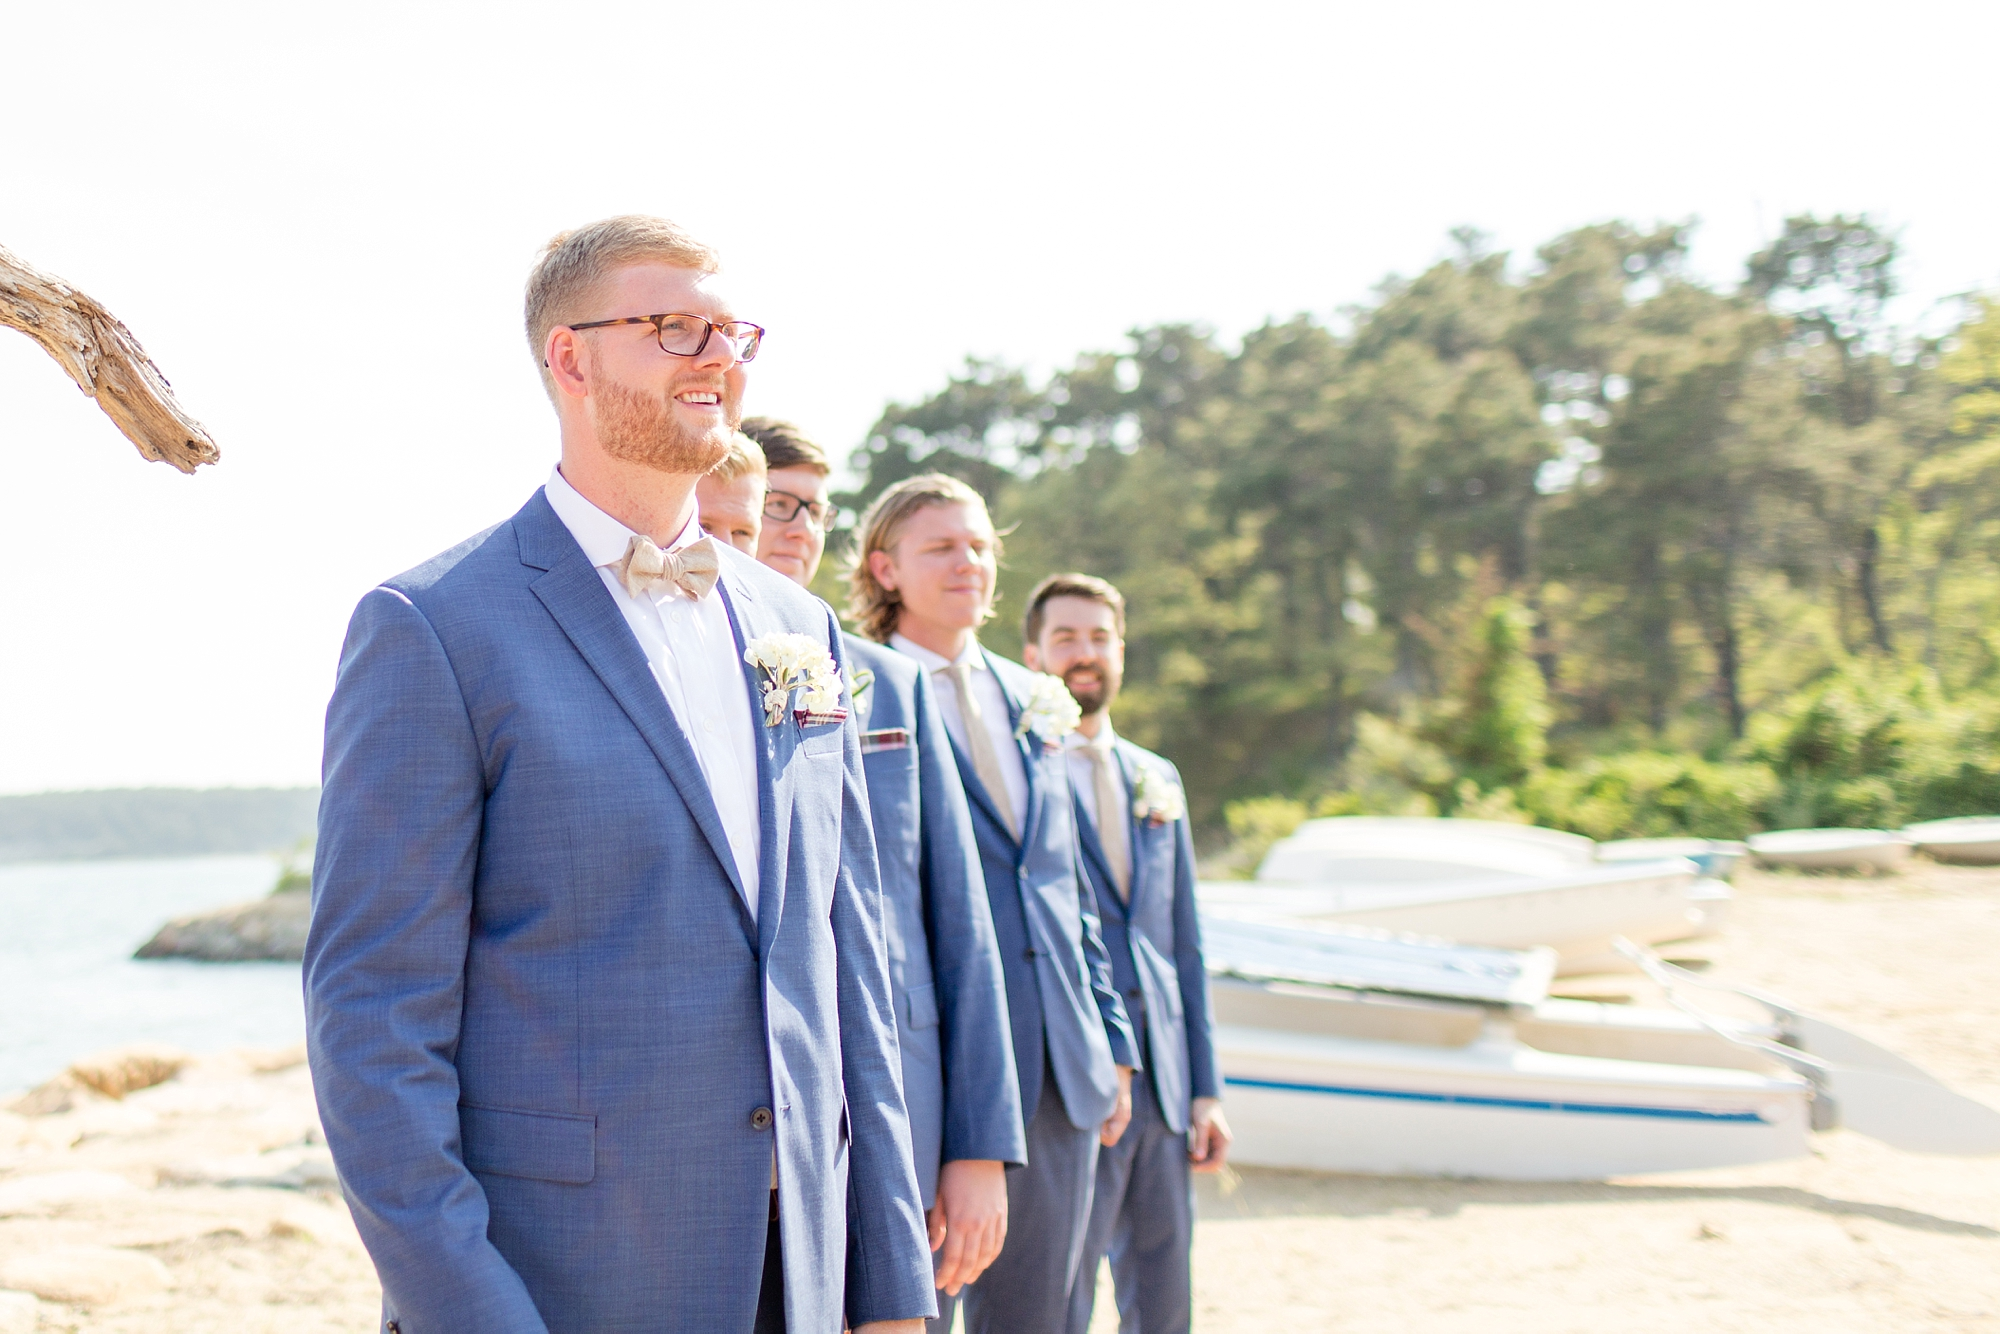 Goodman 5-Ceremony-628_anna grace photography wellfleet cape cod massachusetts destination wedding photographer Chequessett Yacht and Country Club wedding photo.jpg